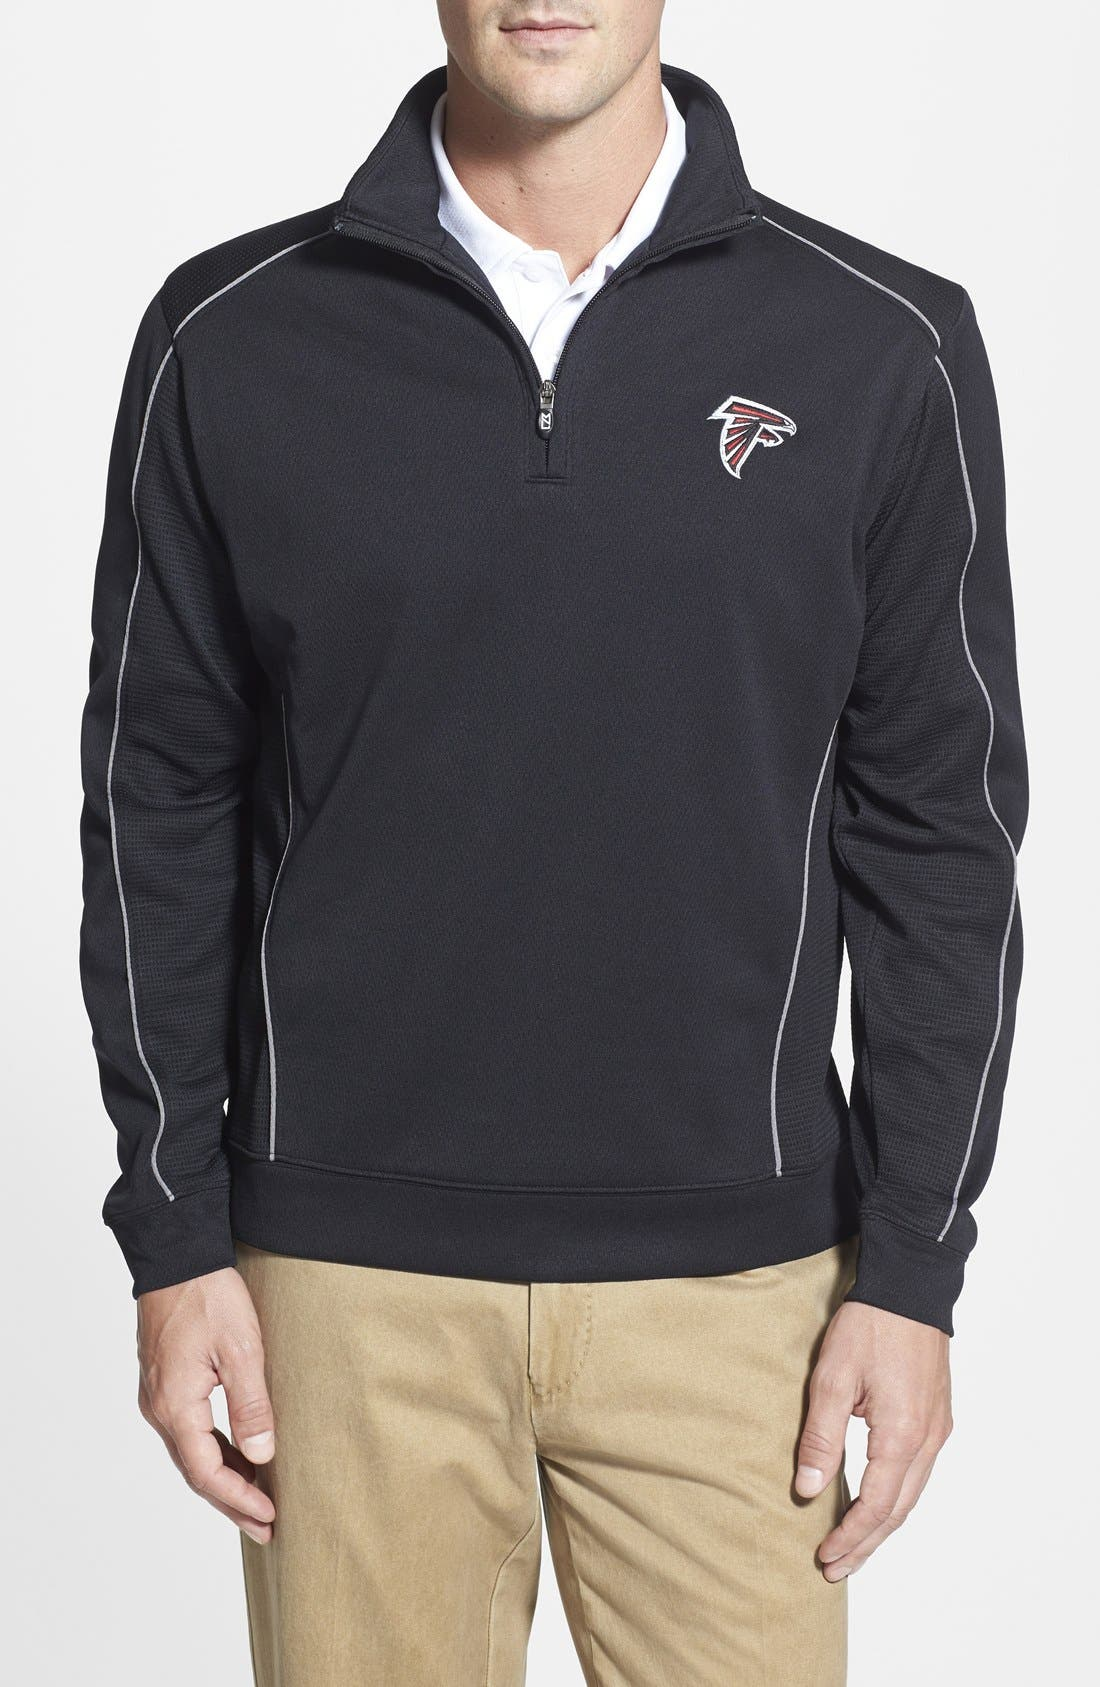 Atlanta Falcons - Edge DryTec Moisture Wicking Half Zip Pullover,                         Main,                         color, Black